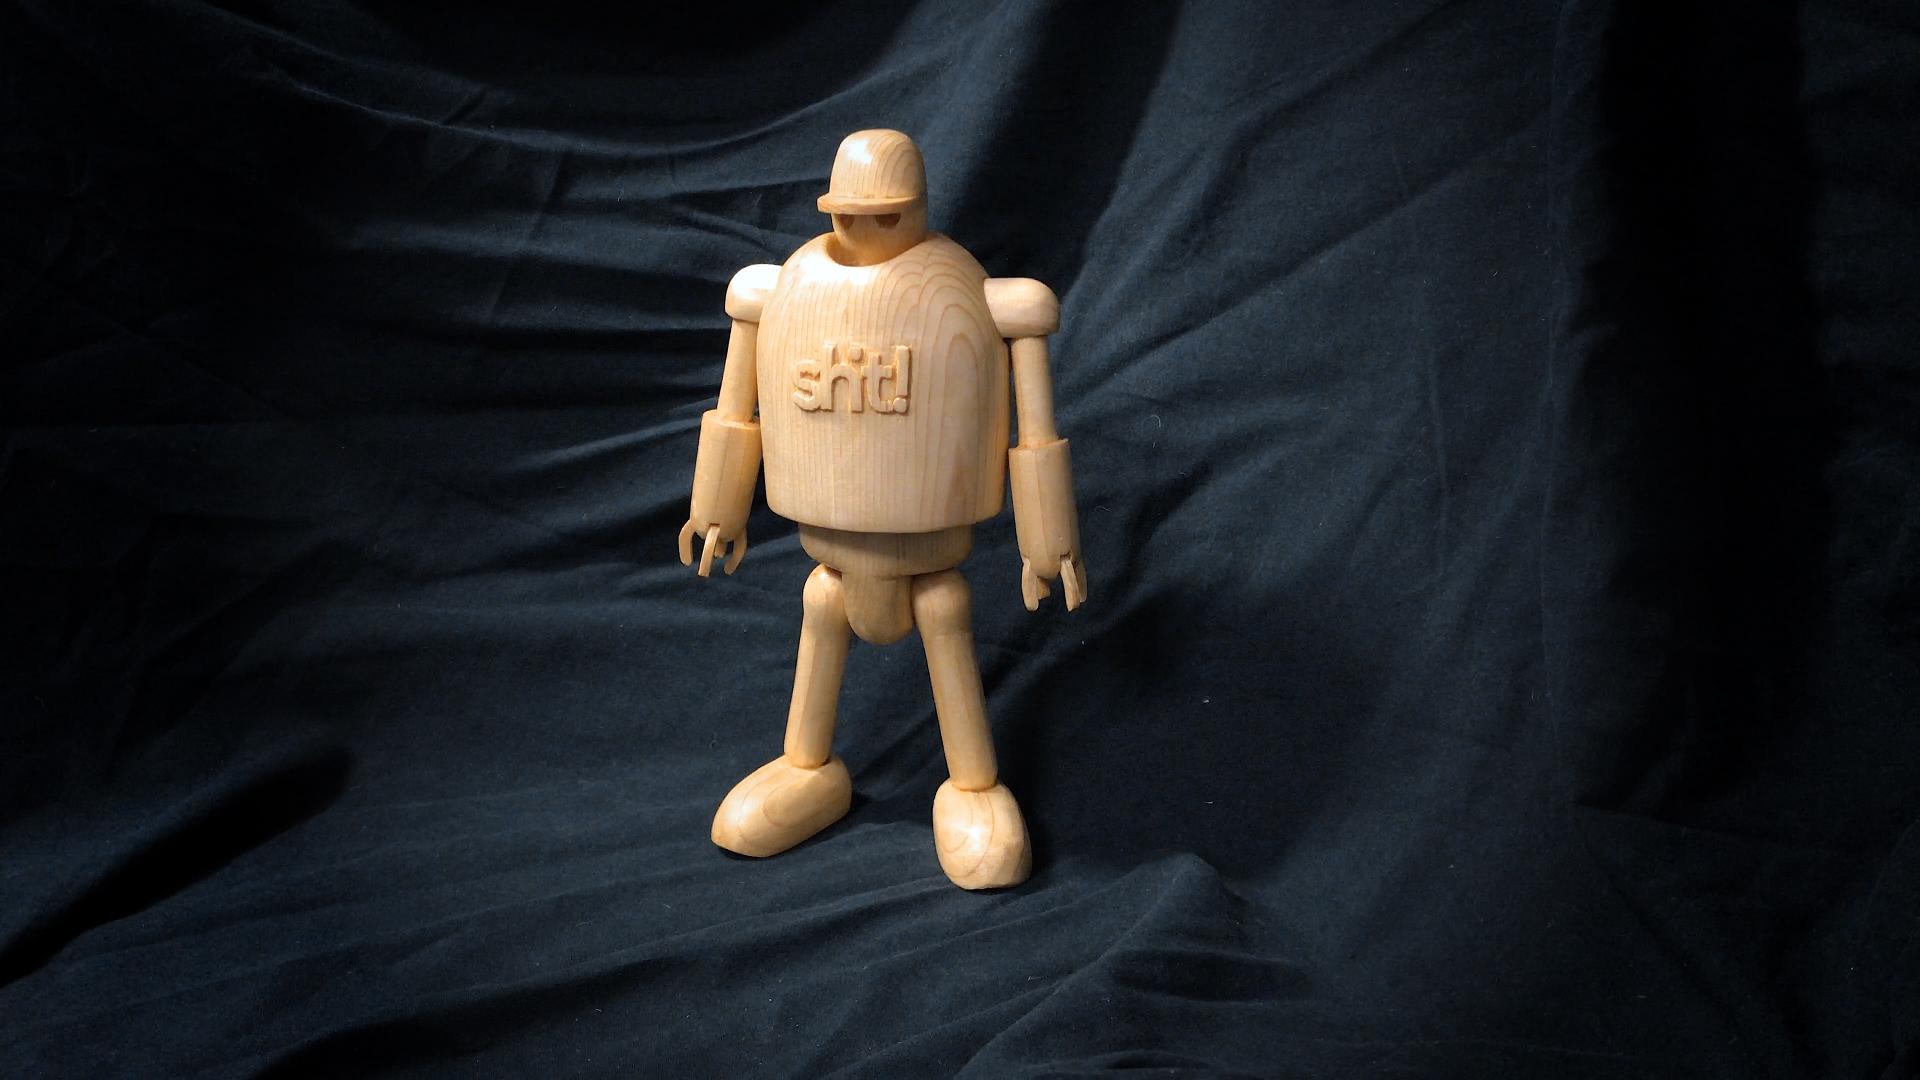 Wood Robot - by Björn Berglund